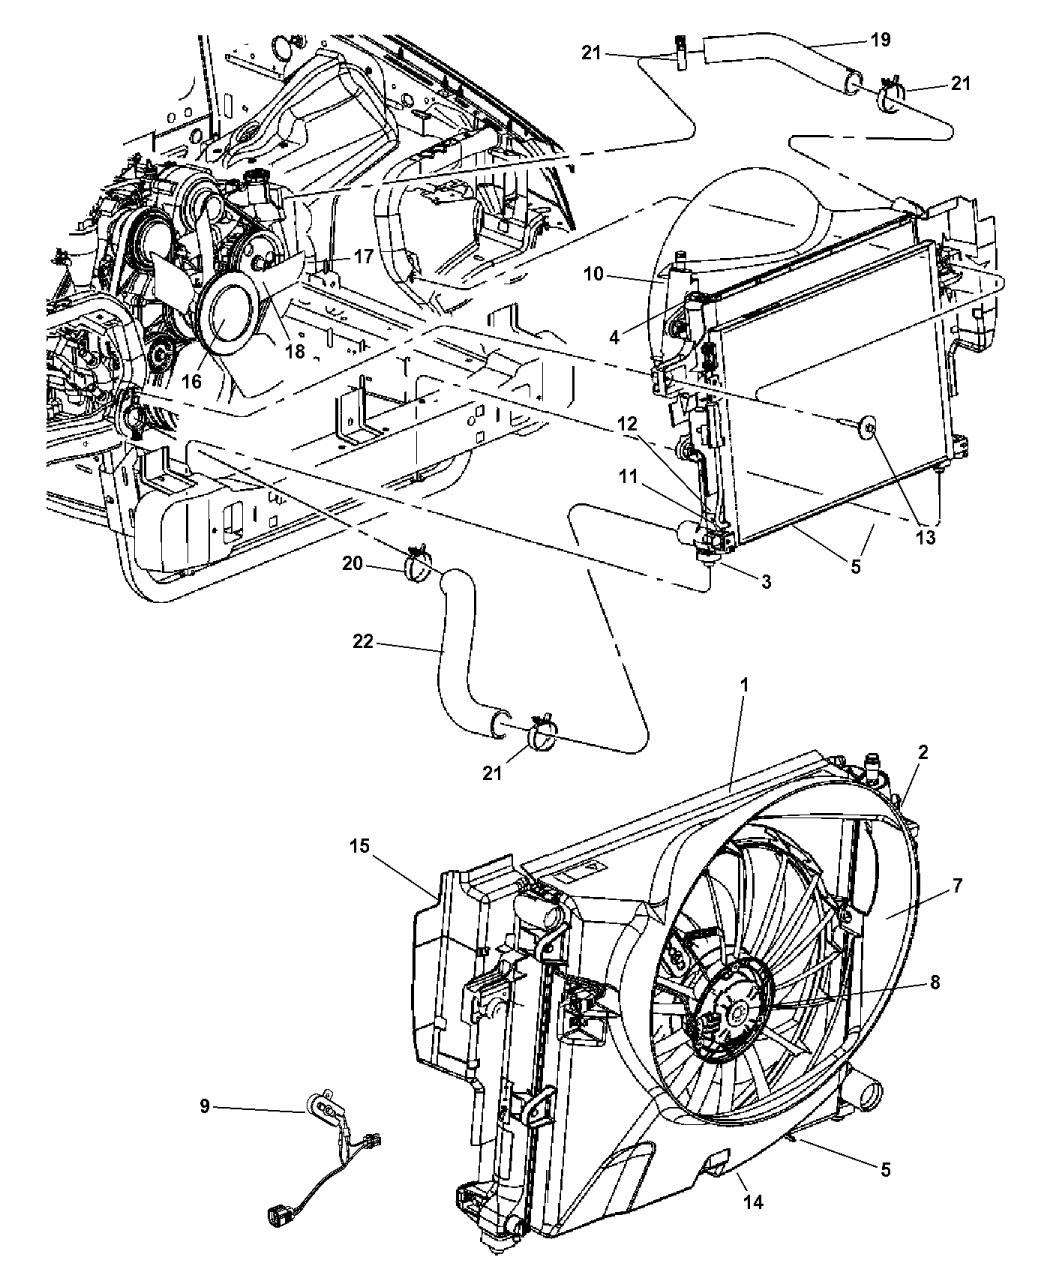 Jeep Grand Cherokee Parts Diagram